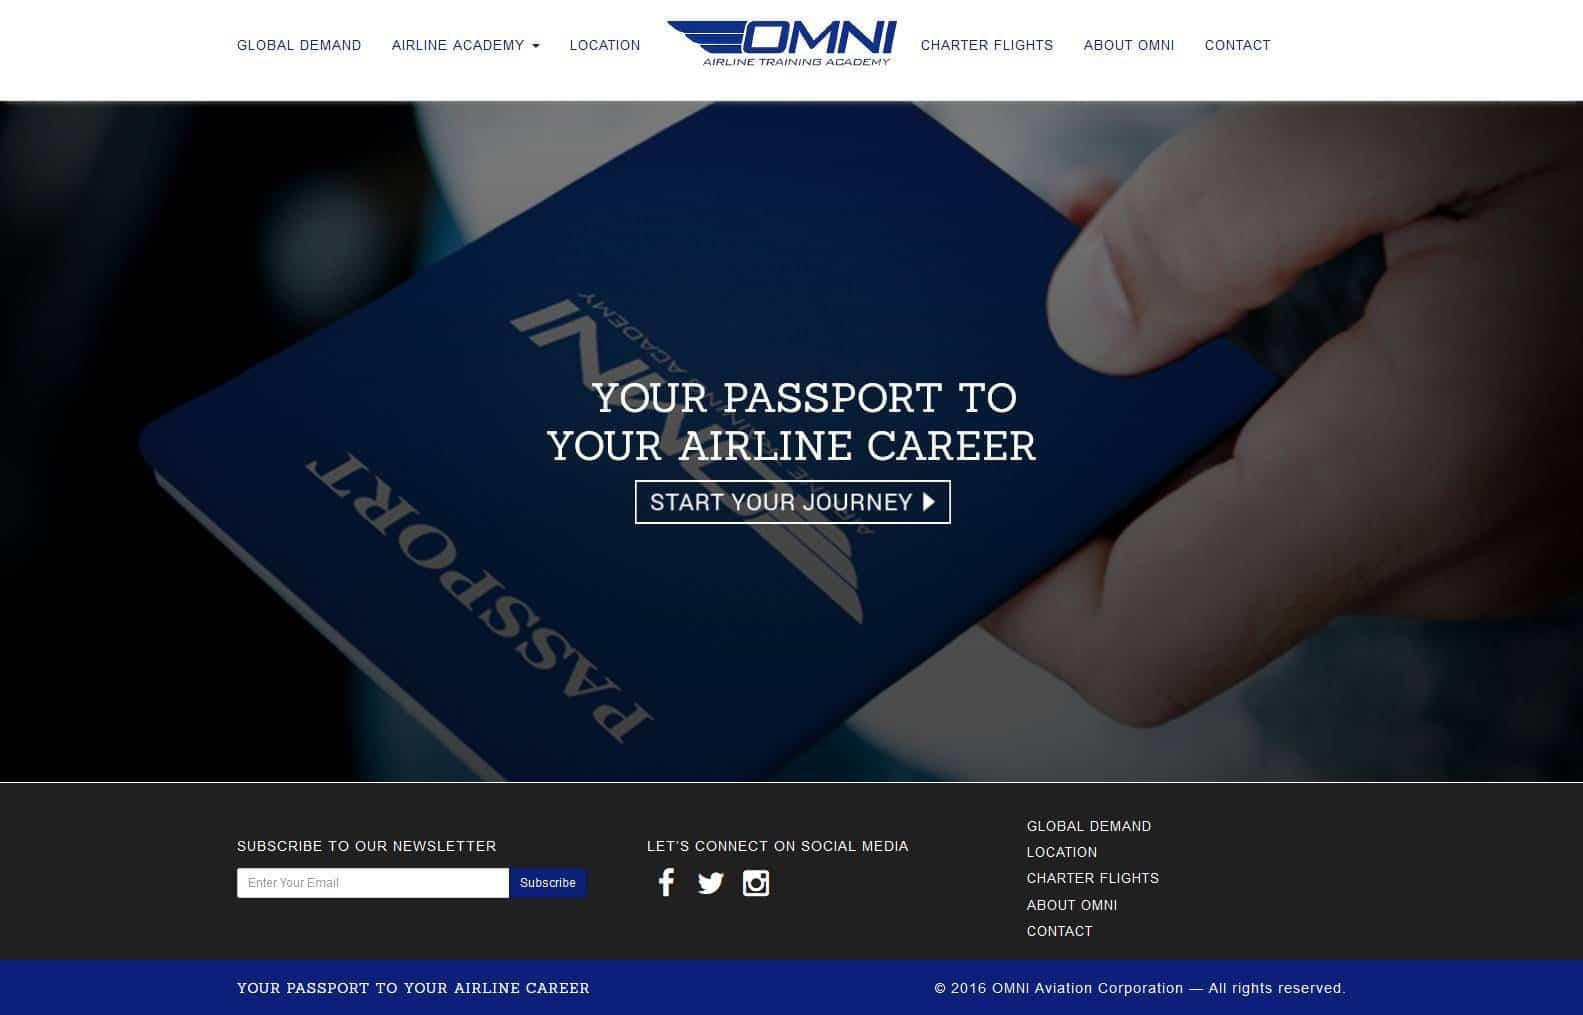 Partner Omni Aviation Corporation